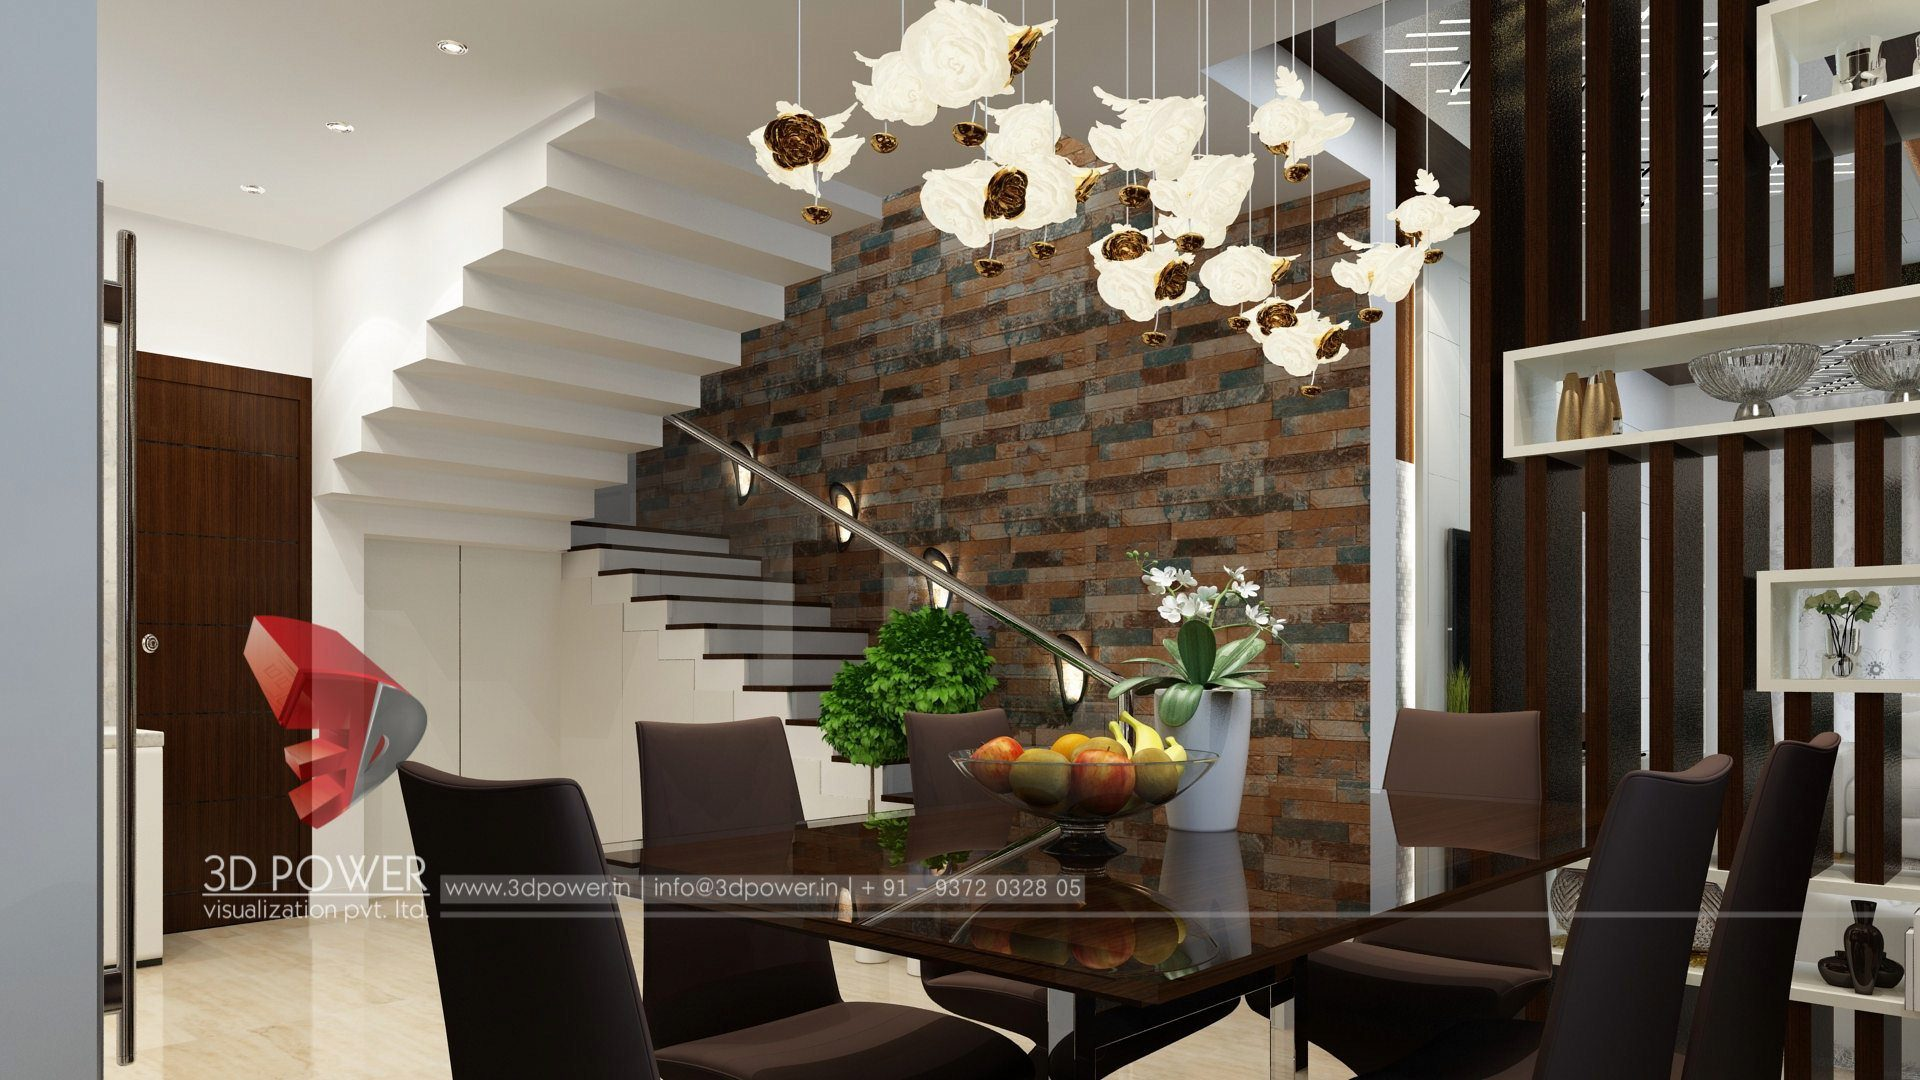 3d Interior Design Services Home Design